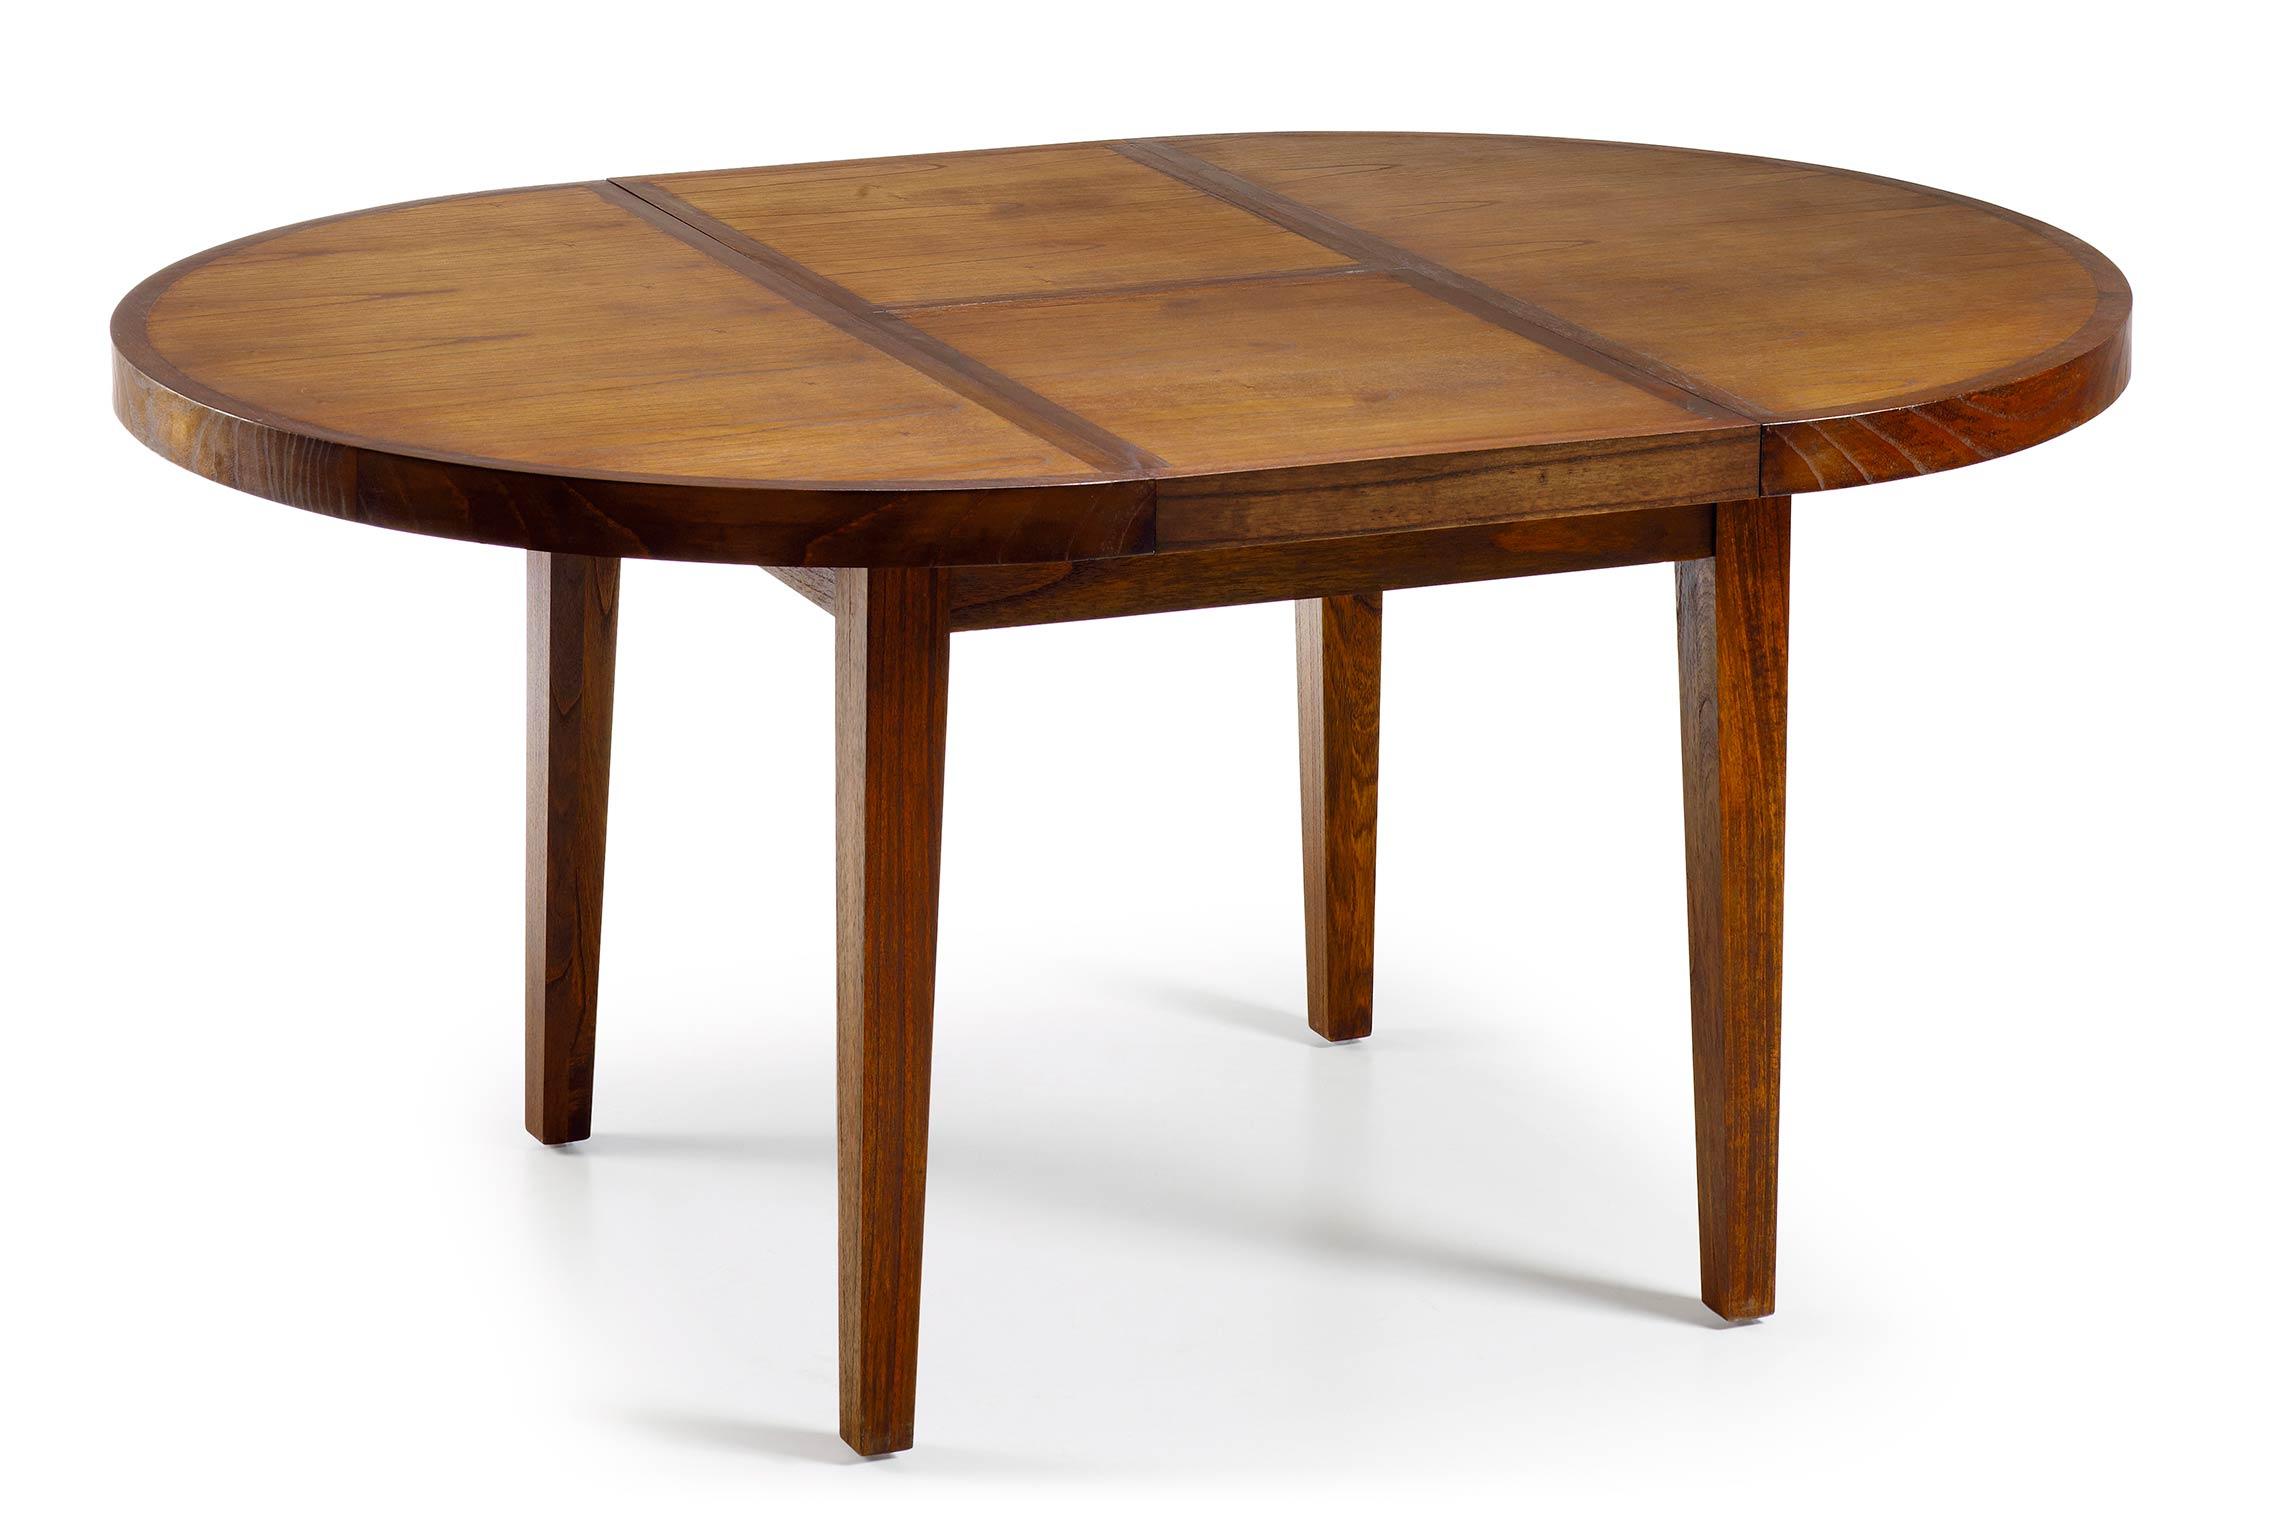 Table basse en bois avec rallonge